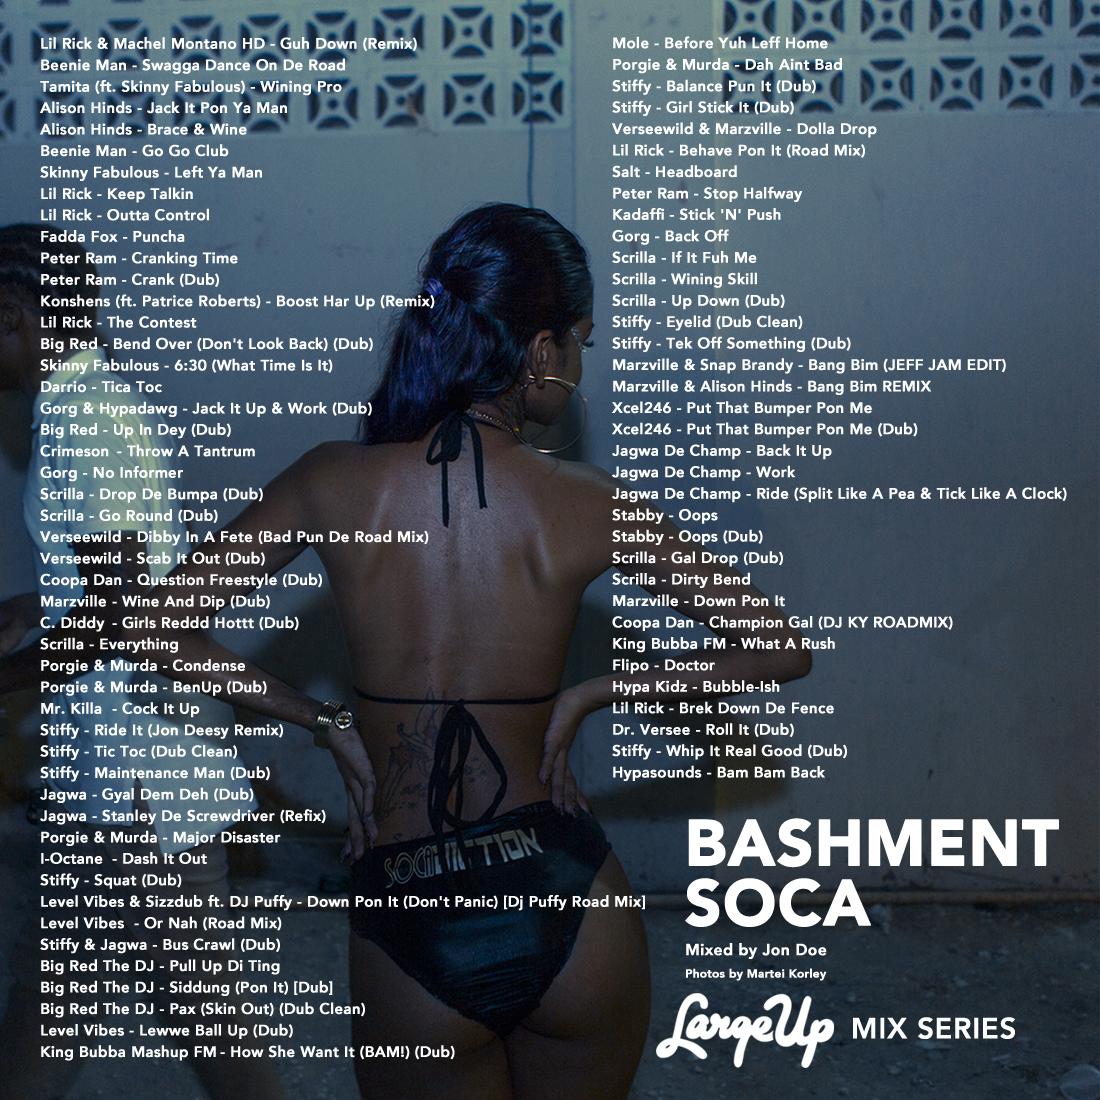 bashment-soca-back-1